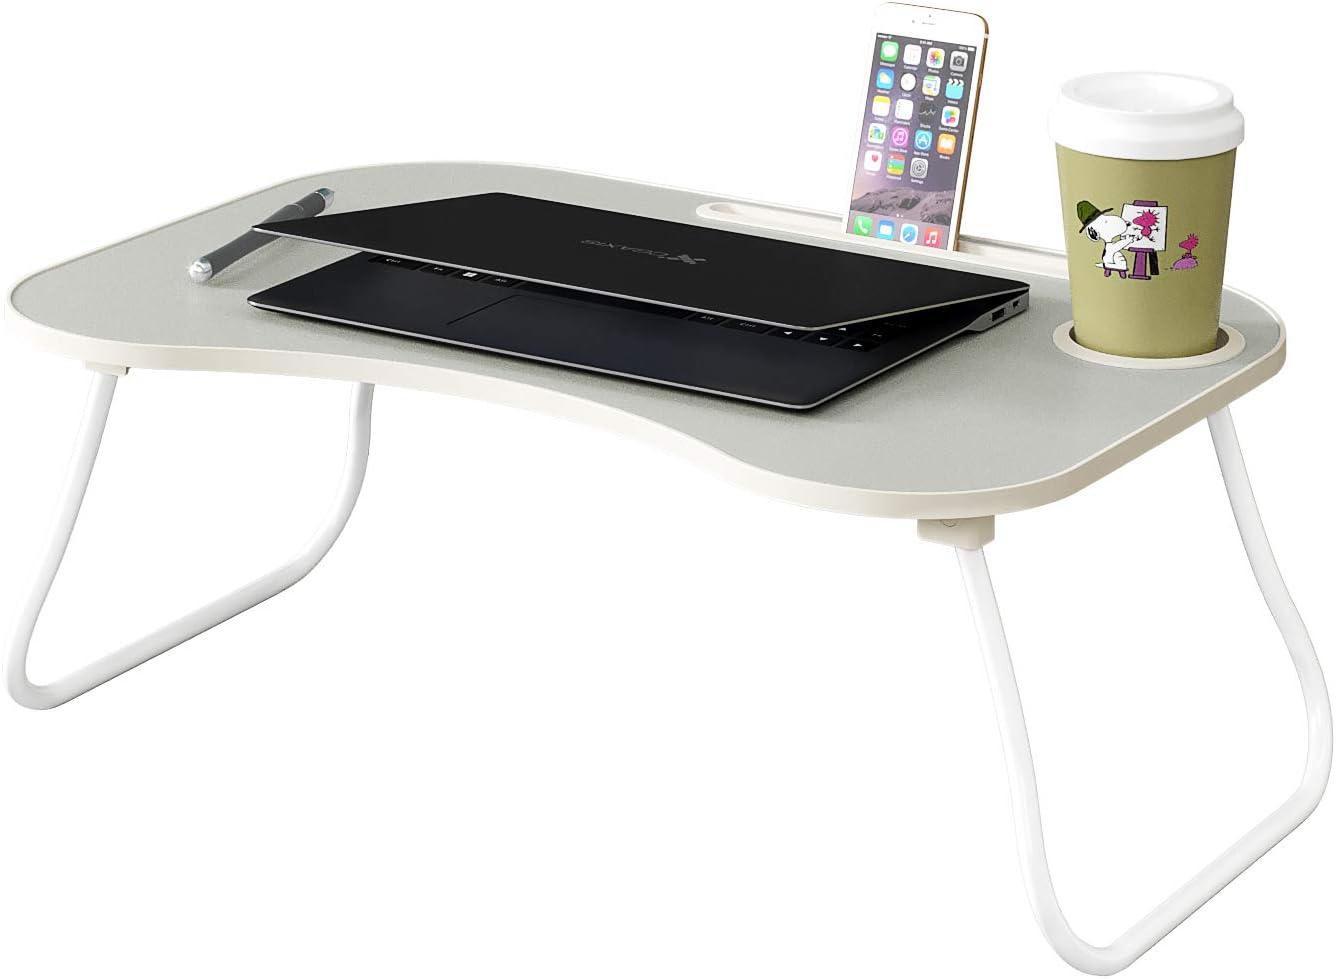 HOME BI Laptop Desk Portable Standing Desk, Foldable Sofa Breakfast Tray, Notebook Stand Reading Holder, Bed Writing Desk with Cup Holder, Pen & Phone Holder (Light Grey)